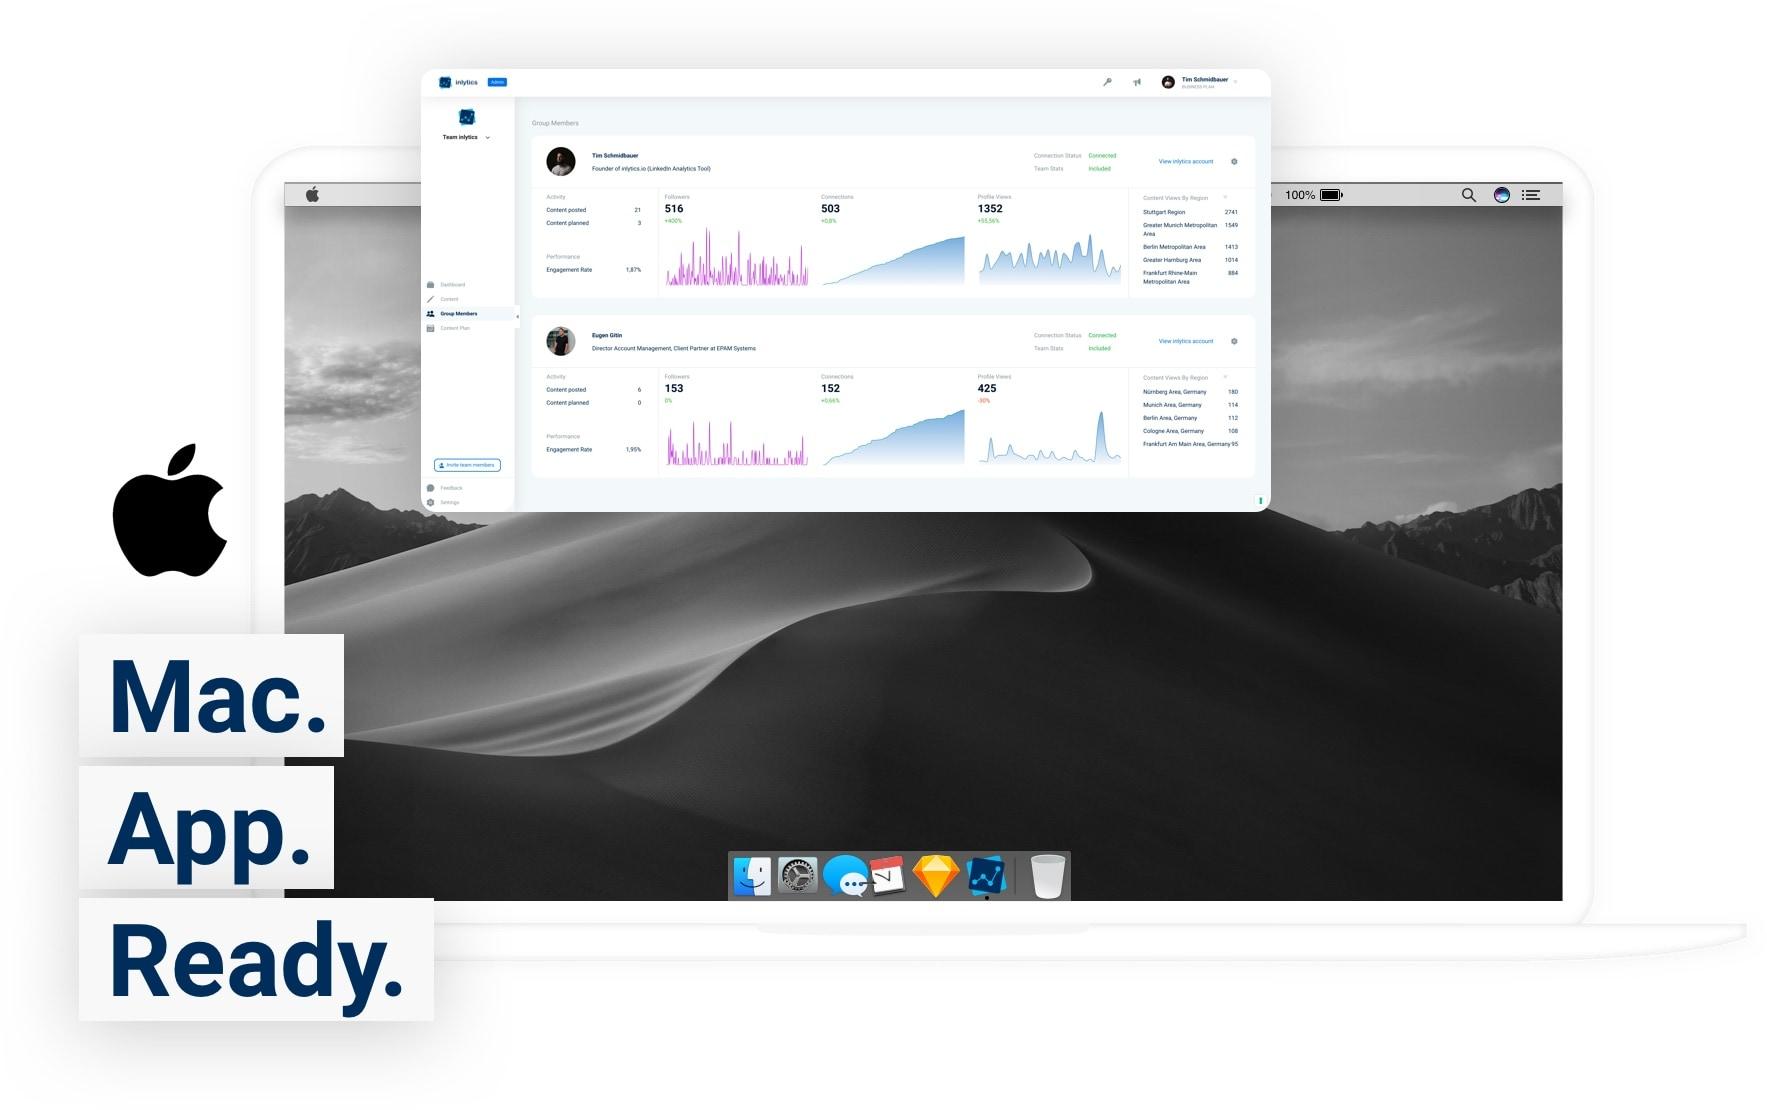 inlytics mac app image for your linkedin analytics tool on your desktop